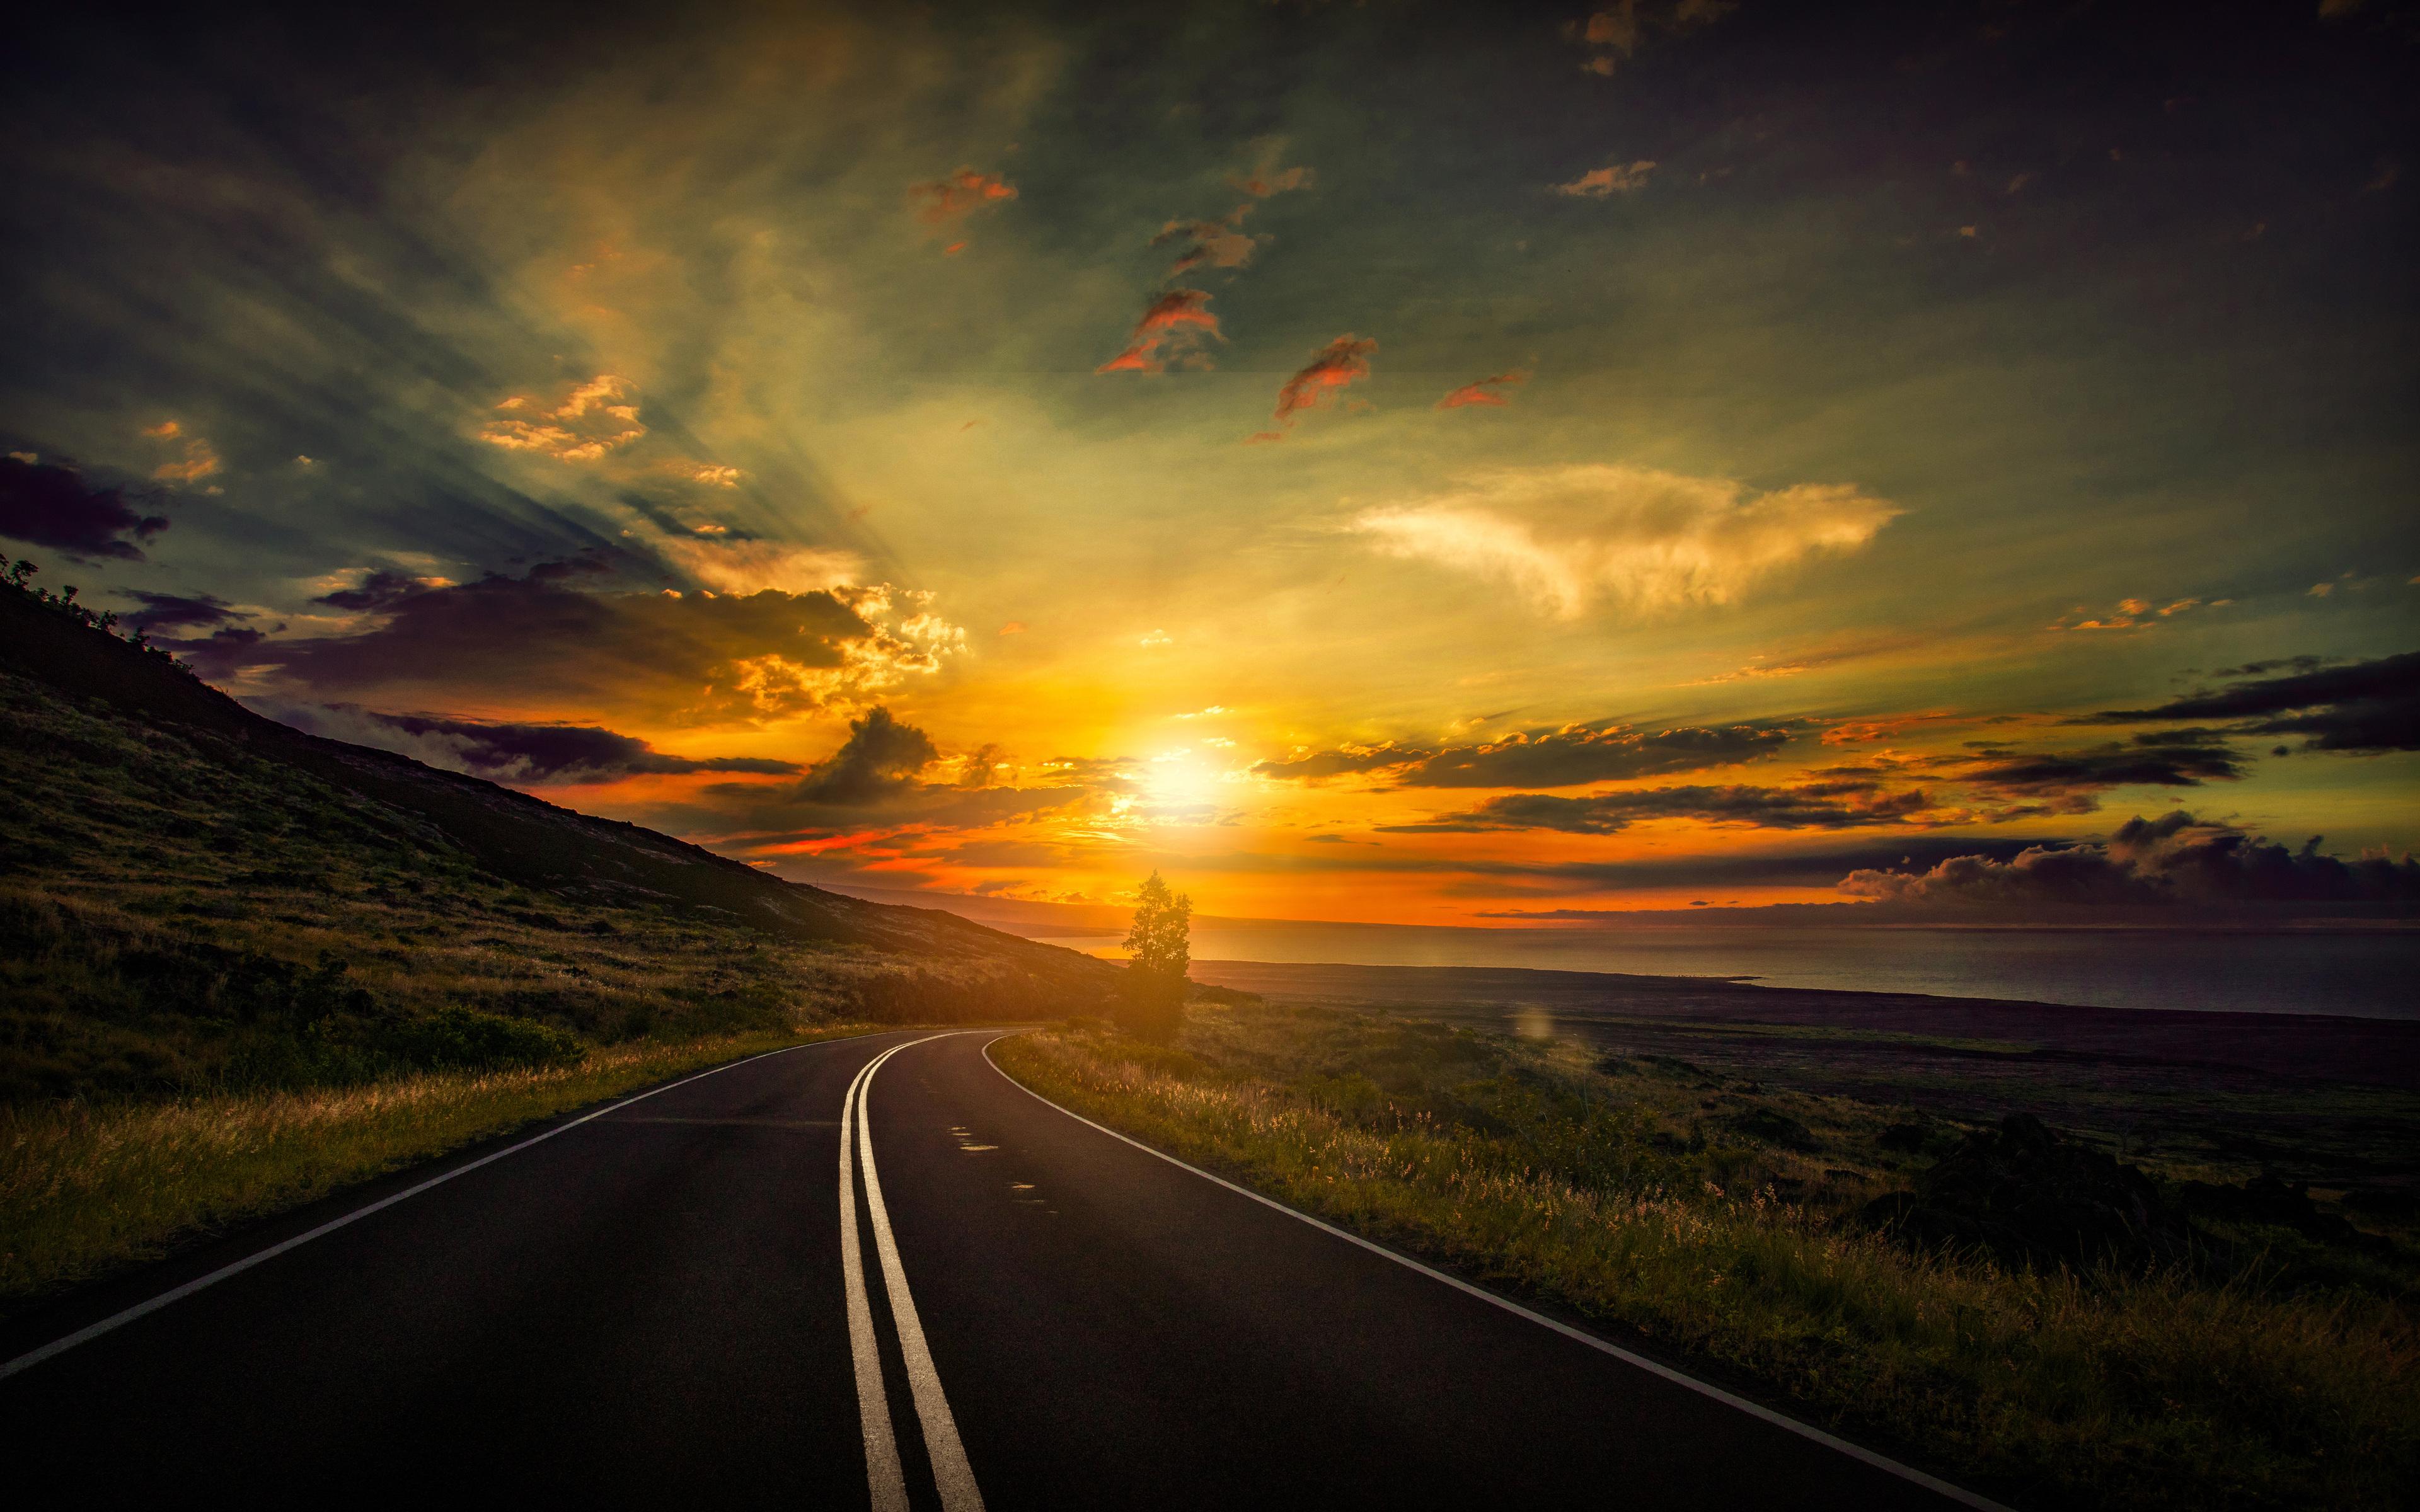 cool-sunset-road-view-8k-xc.jpg